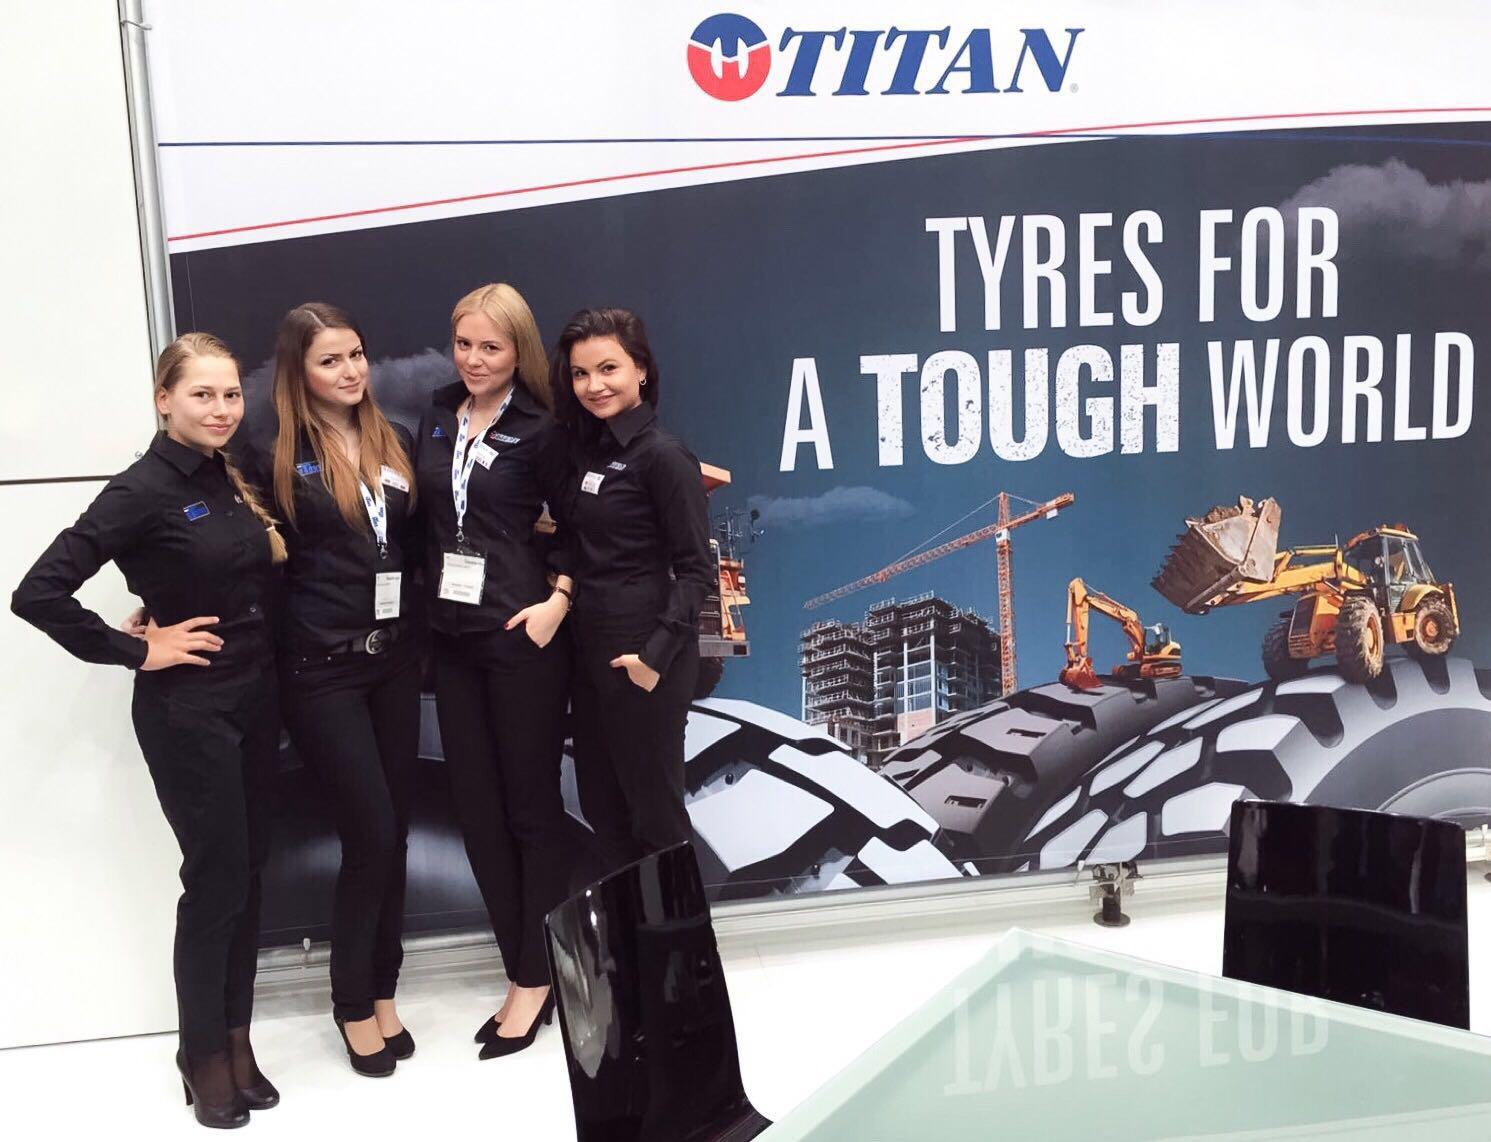 Exhibition Girls at Automechanika